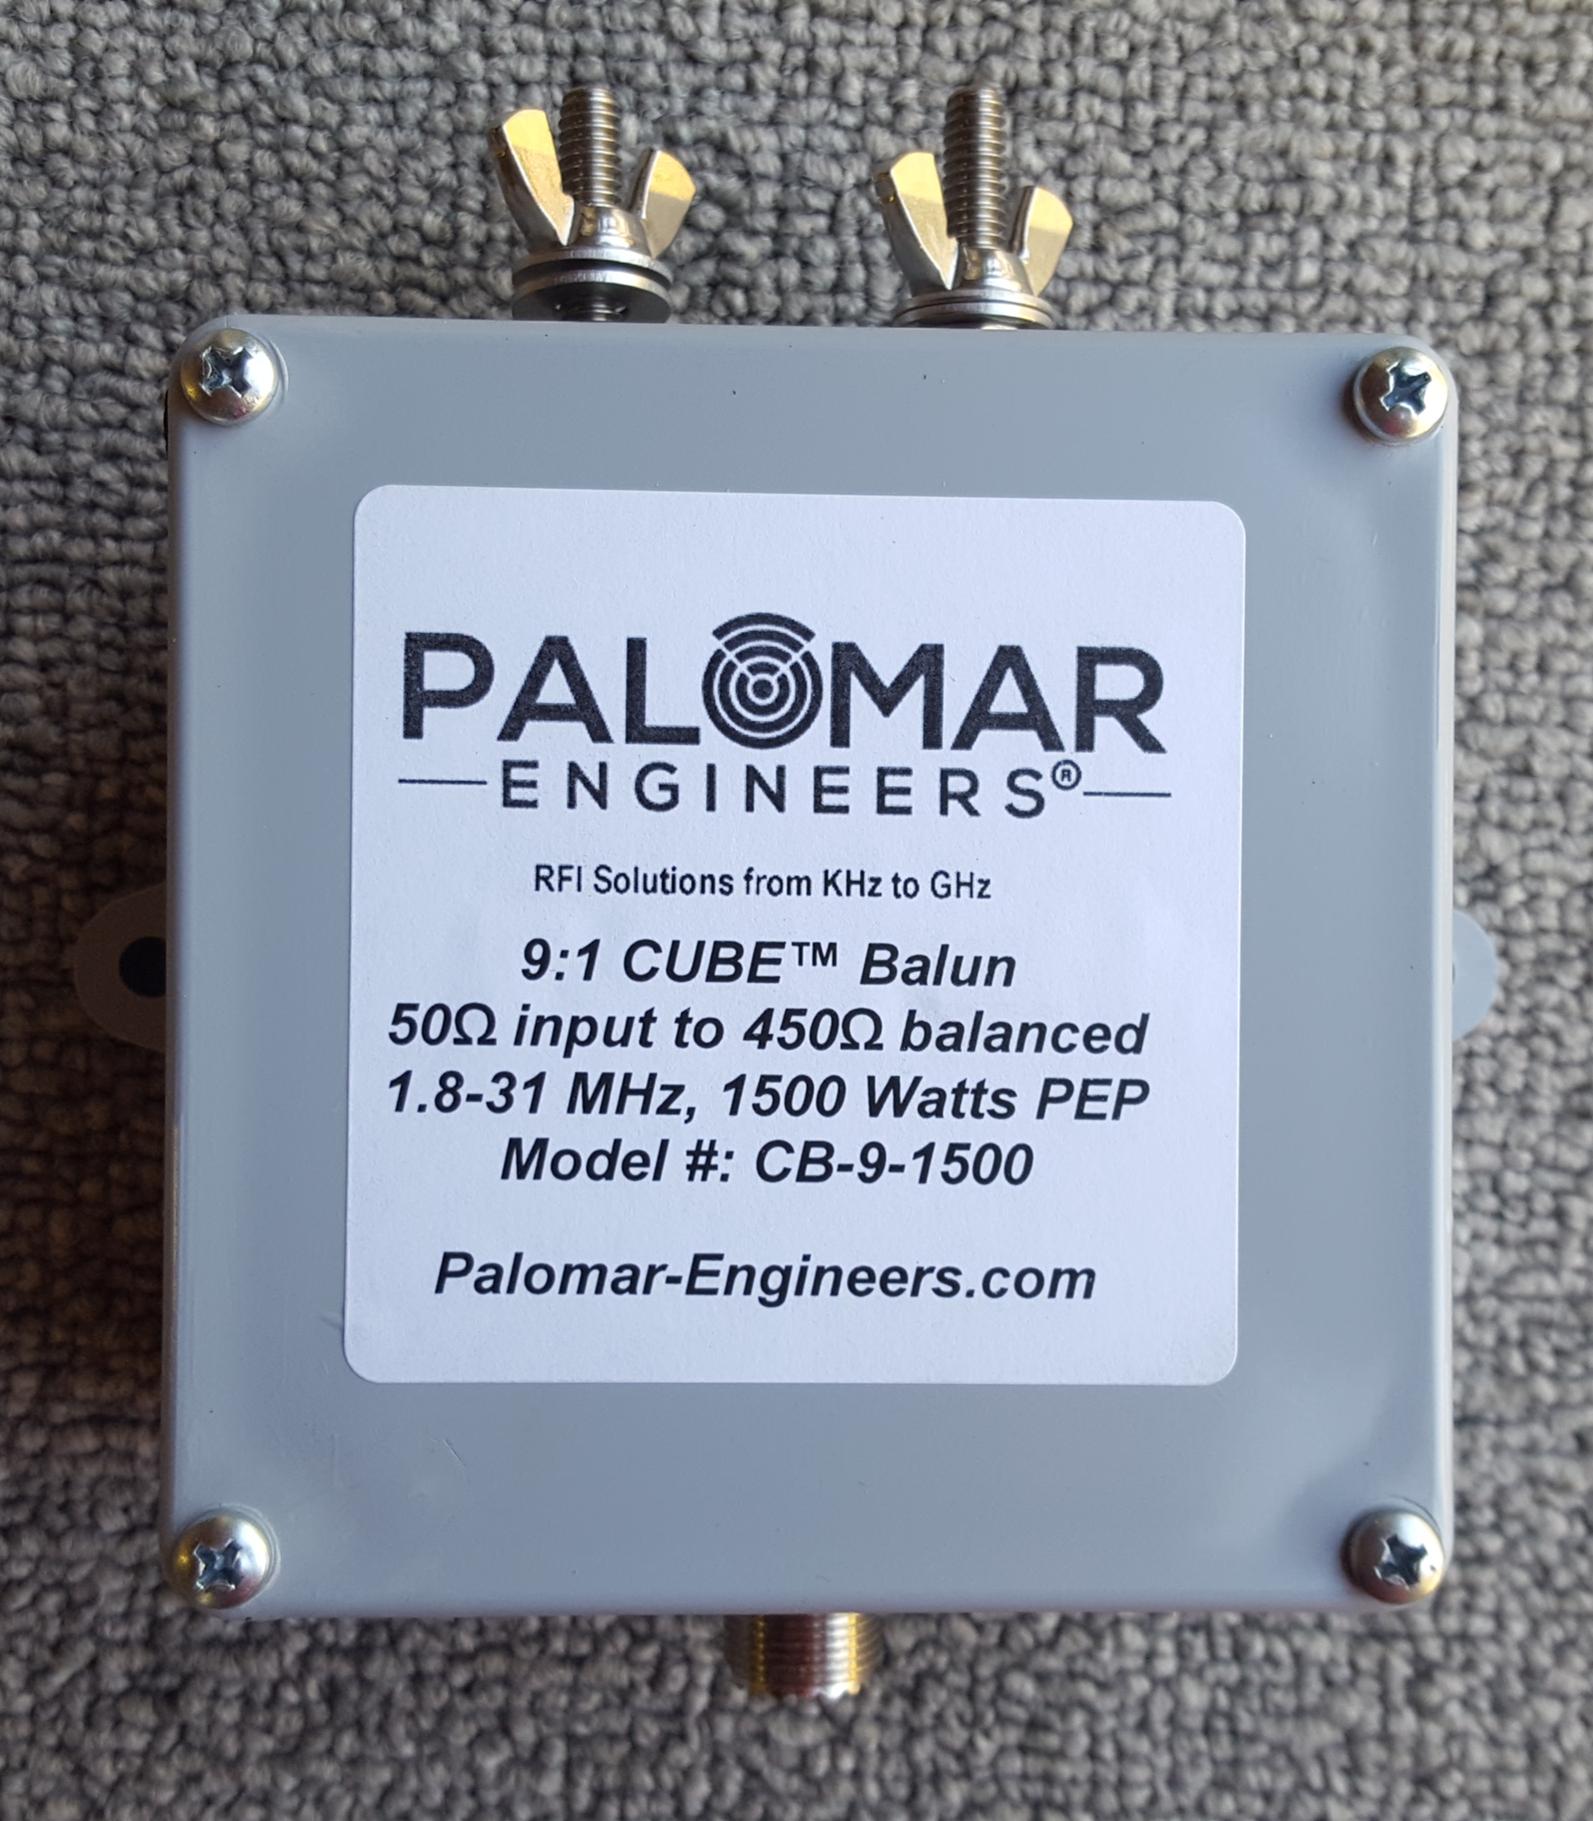 50:450 ohm (9:1) CUBE™ Balun, 1.8-31 MHz, 1.5 KW, ladder line, ZEPP, T2FD CB-9-1500